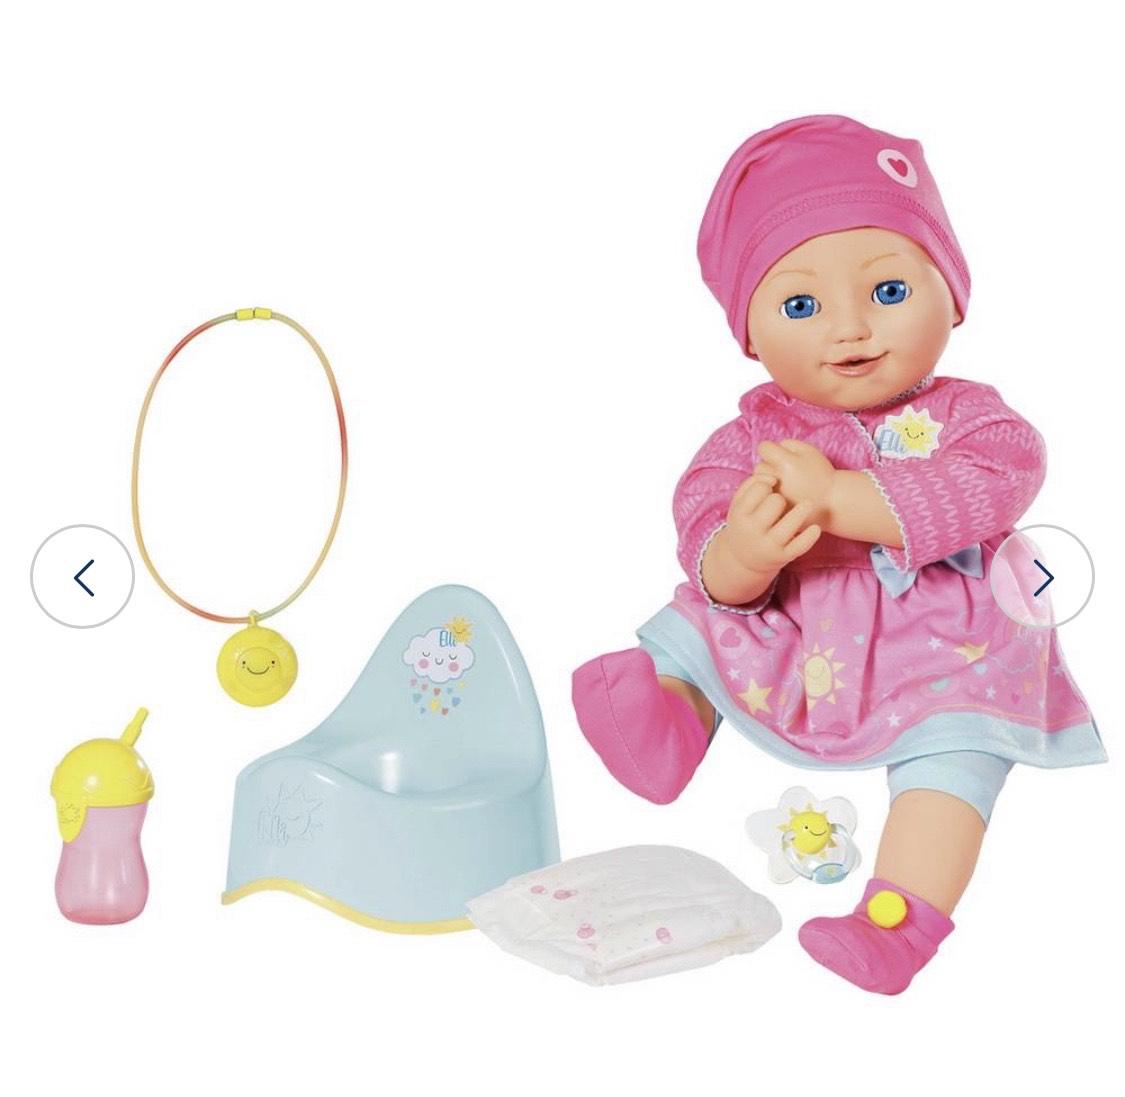 Elli Smiles doll £15 + £3.95 delivery @ Argos